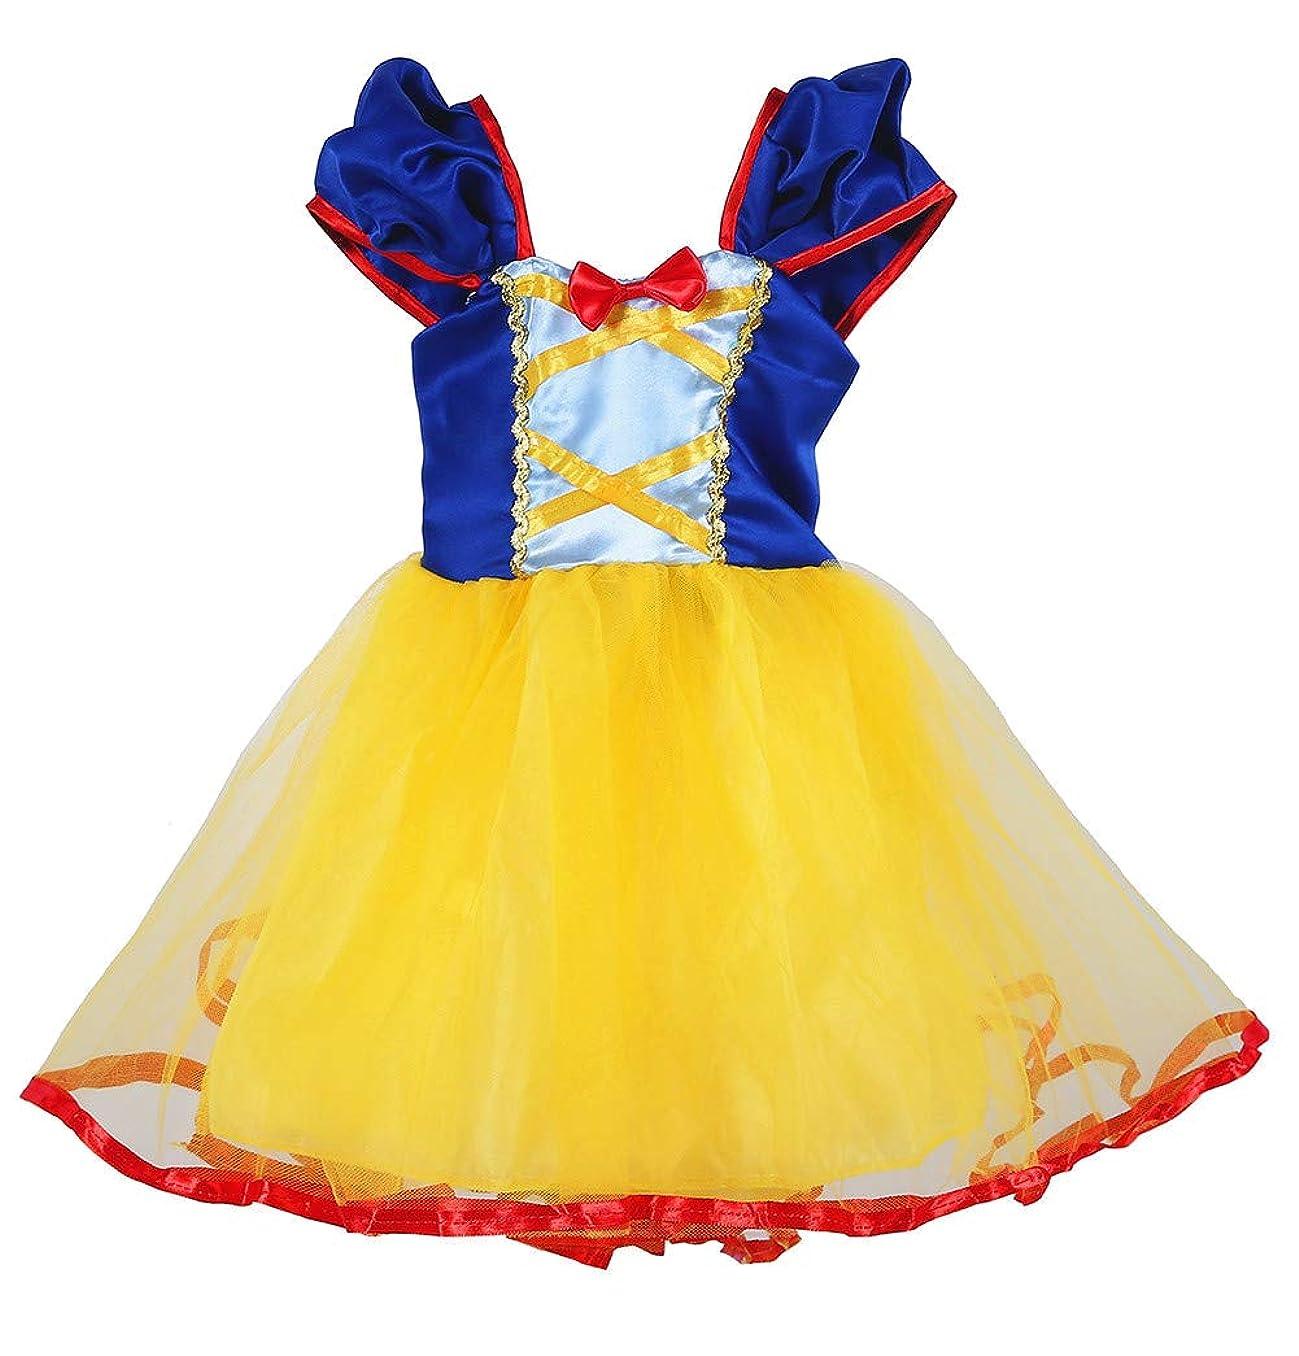 Tutu Dreams Princess(Cinderella,Rapunzel,Aurora,Snowwhite) Costume for Girls Birthday Halloween Party